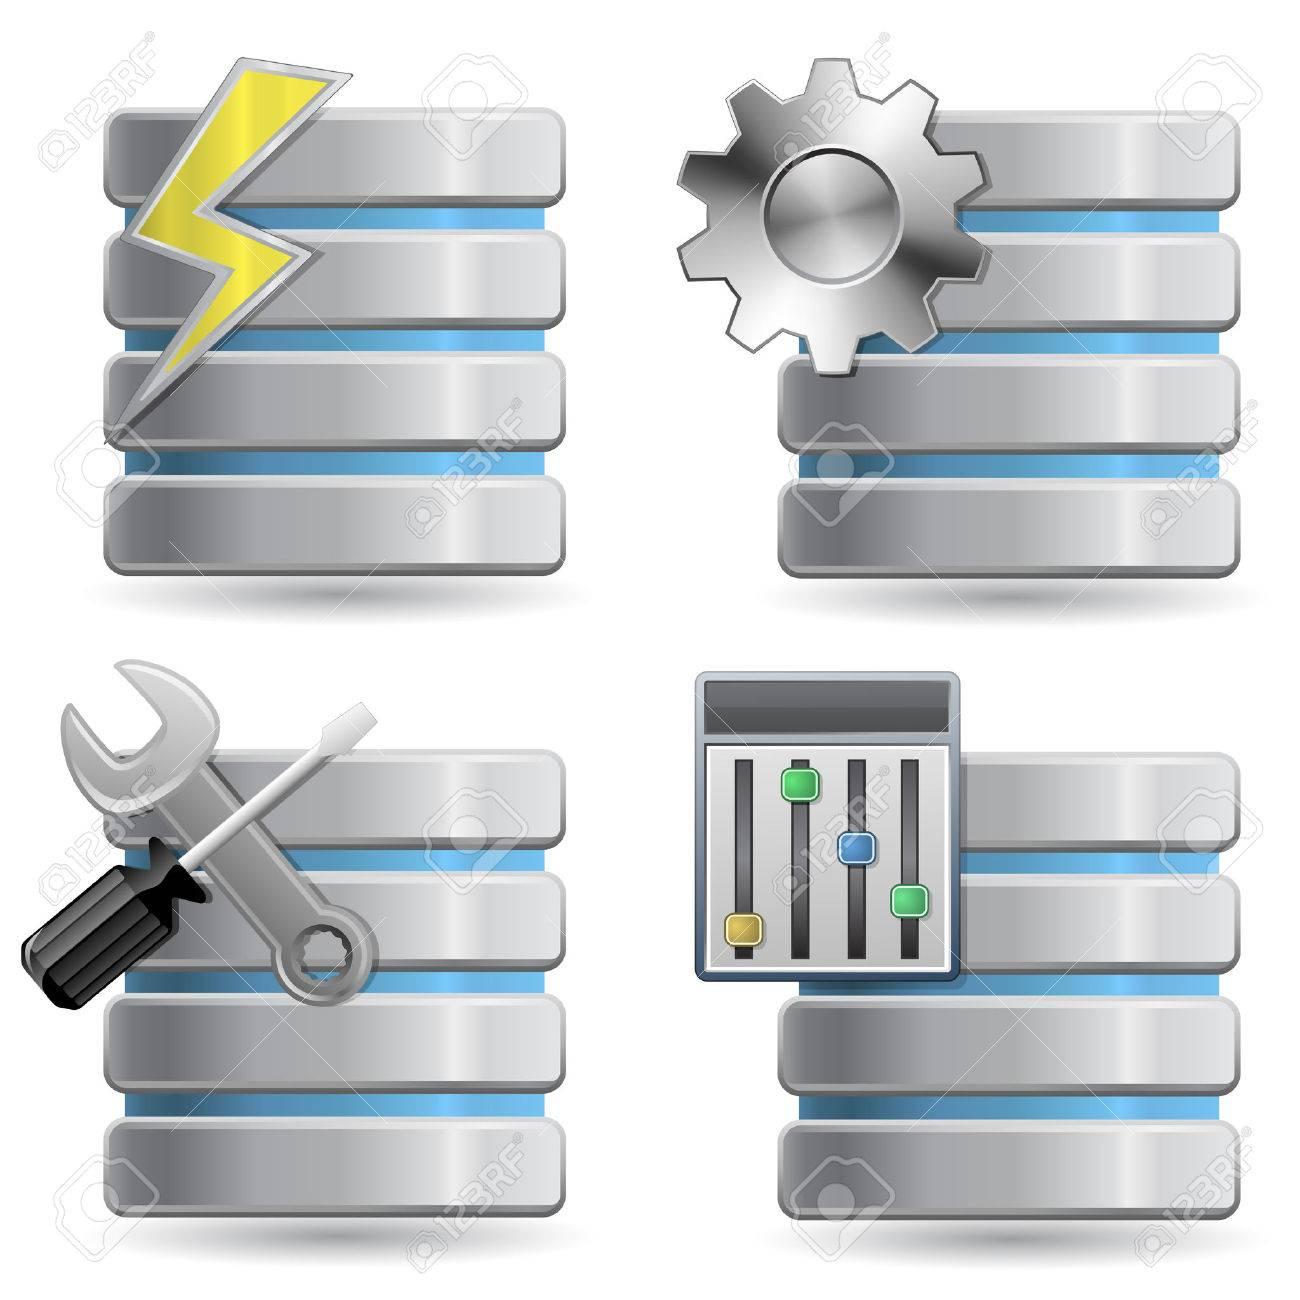 Database - Web Hosting Icons Stock Vector - 6815624